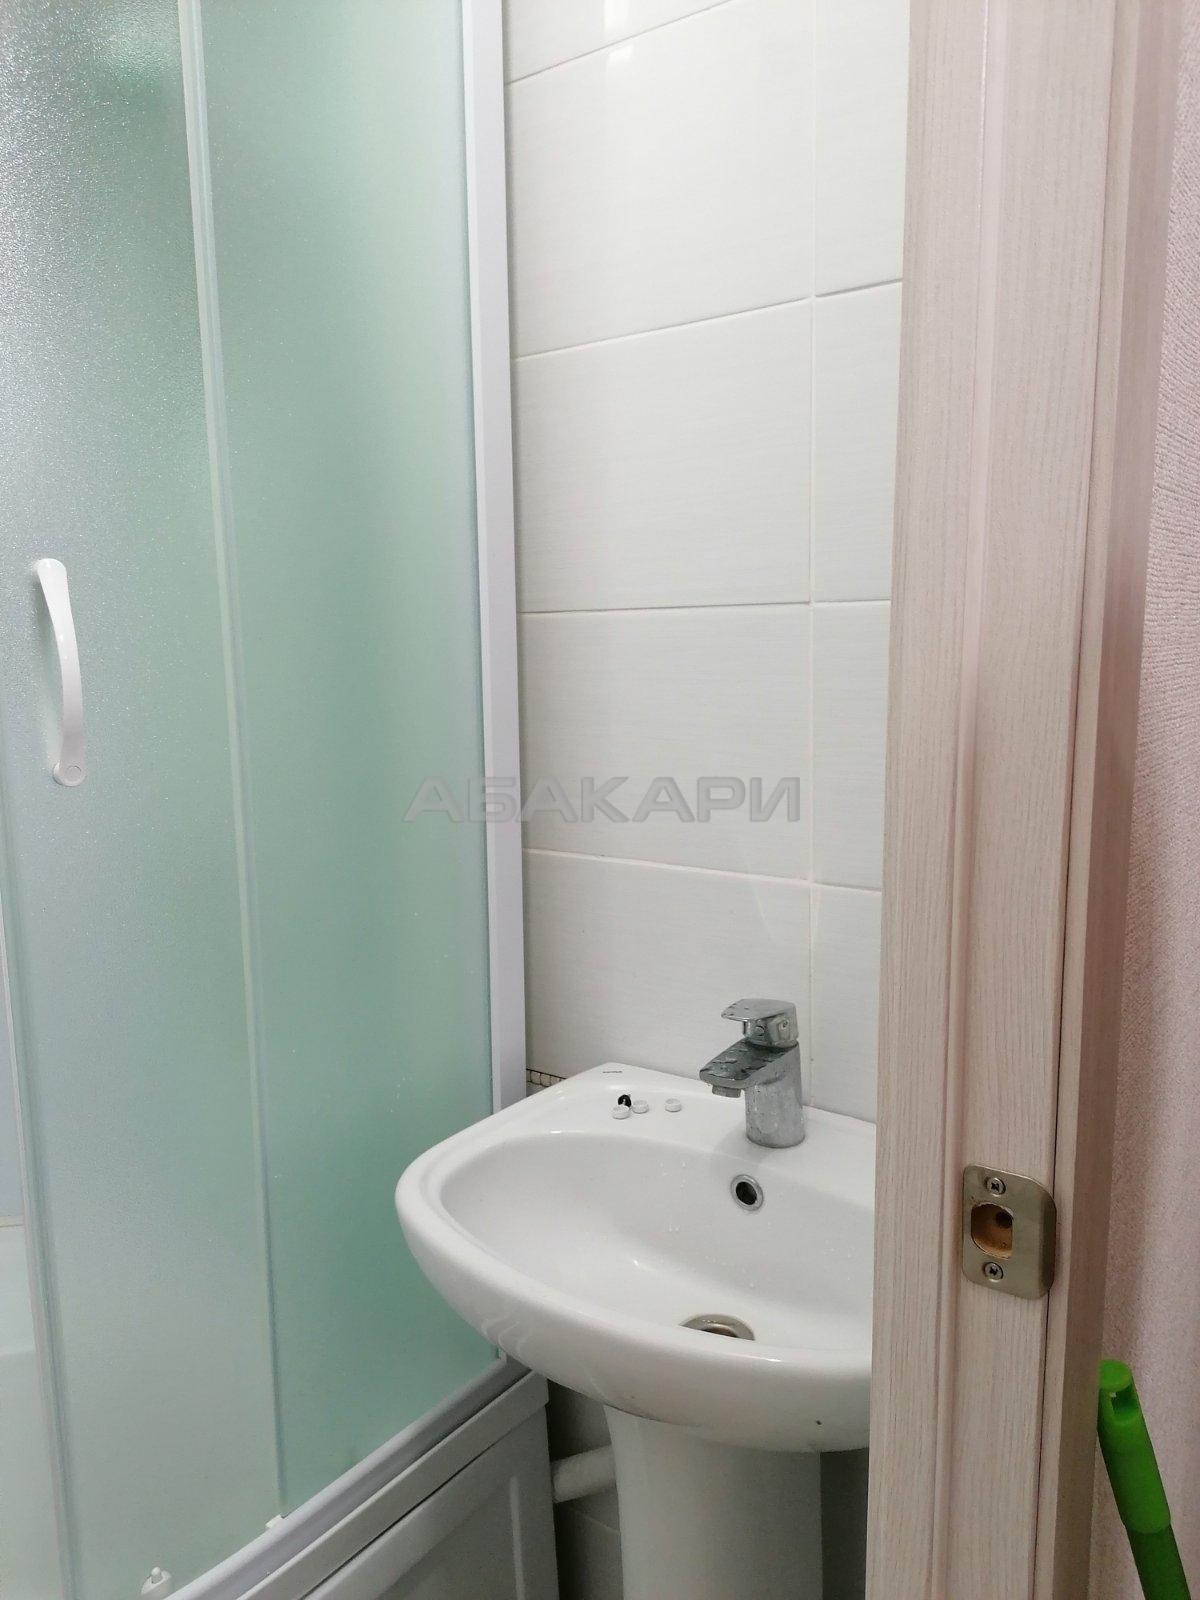 2к квартира Пролетарская улица, 147   15000   аренда в Красноярске фото 4